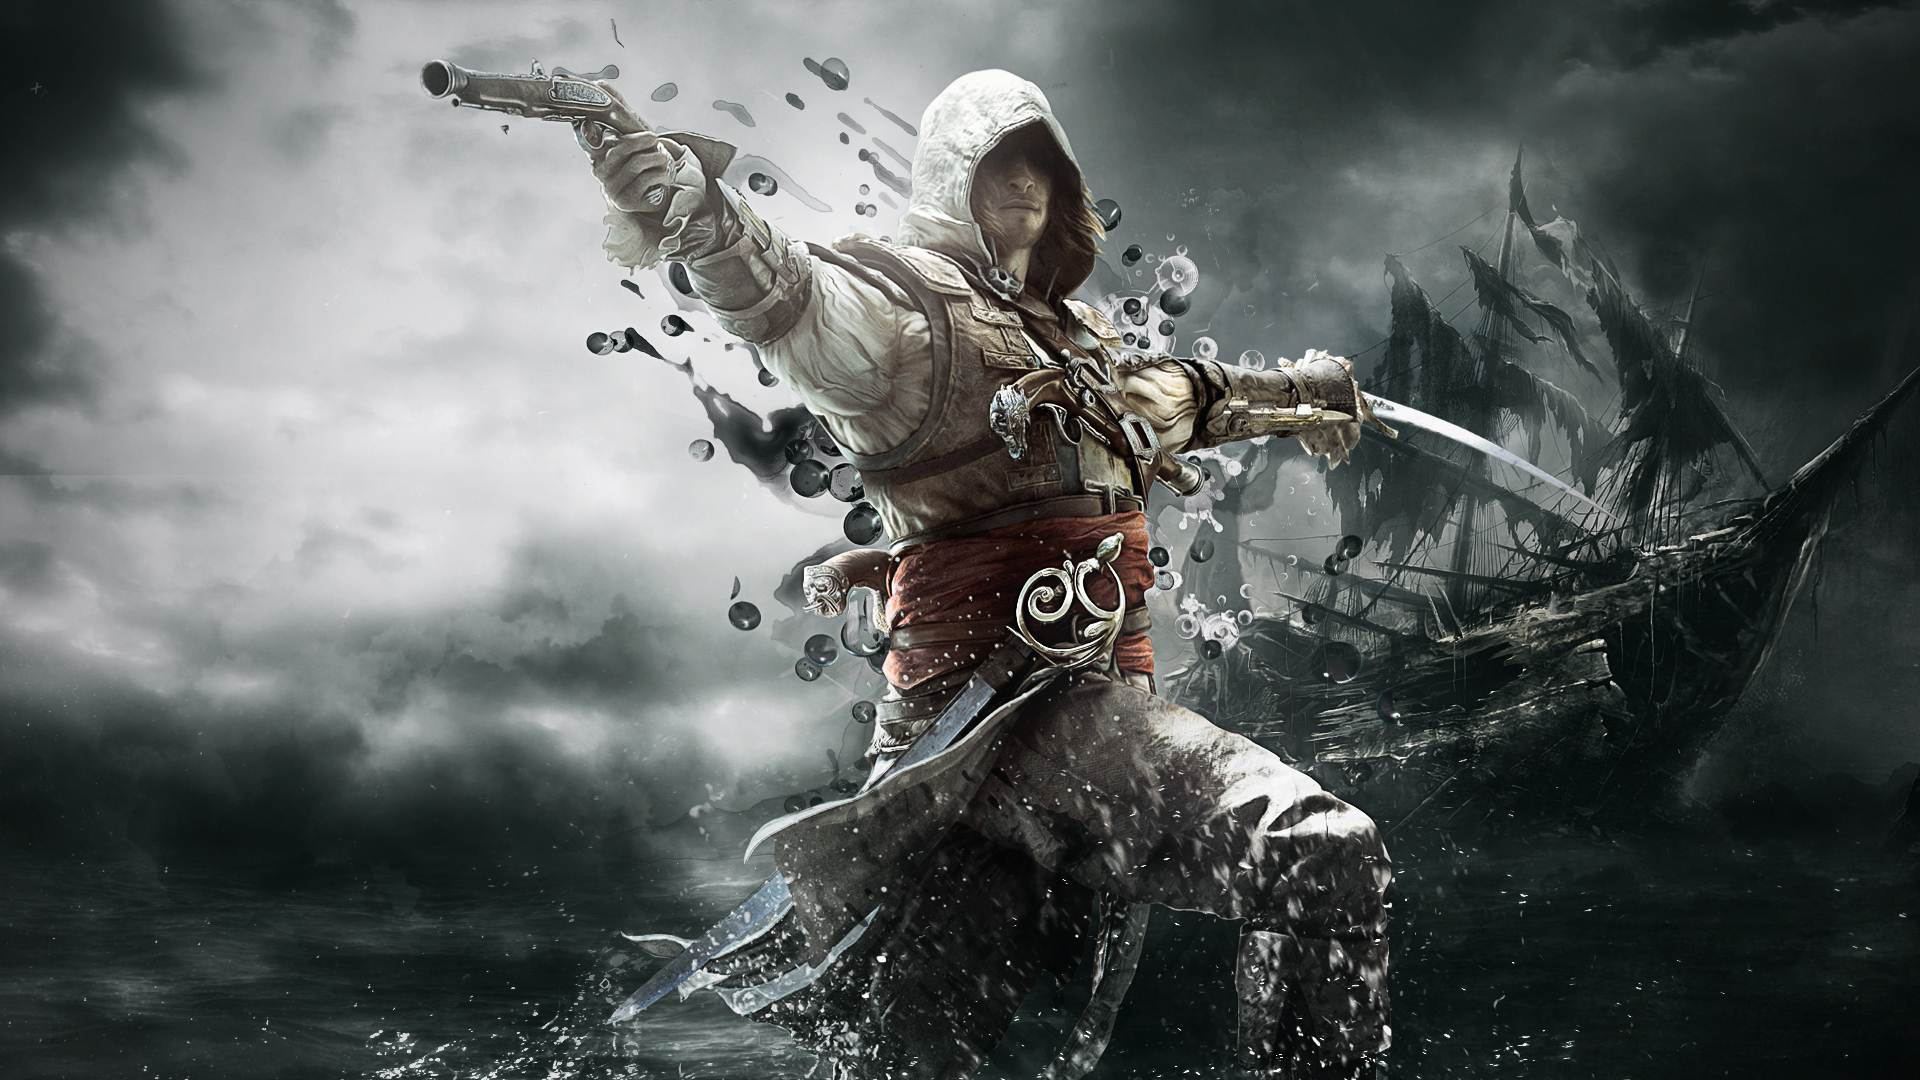 Assassin's Creed 5 Ubisoft's Precarious Step Ahead